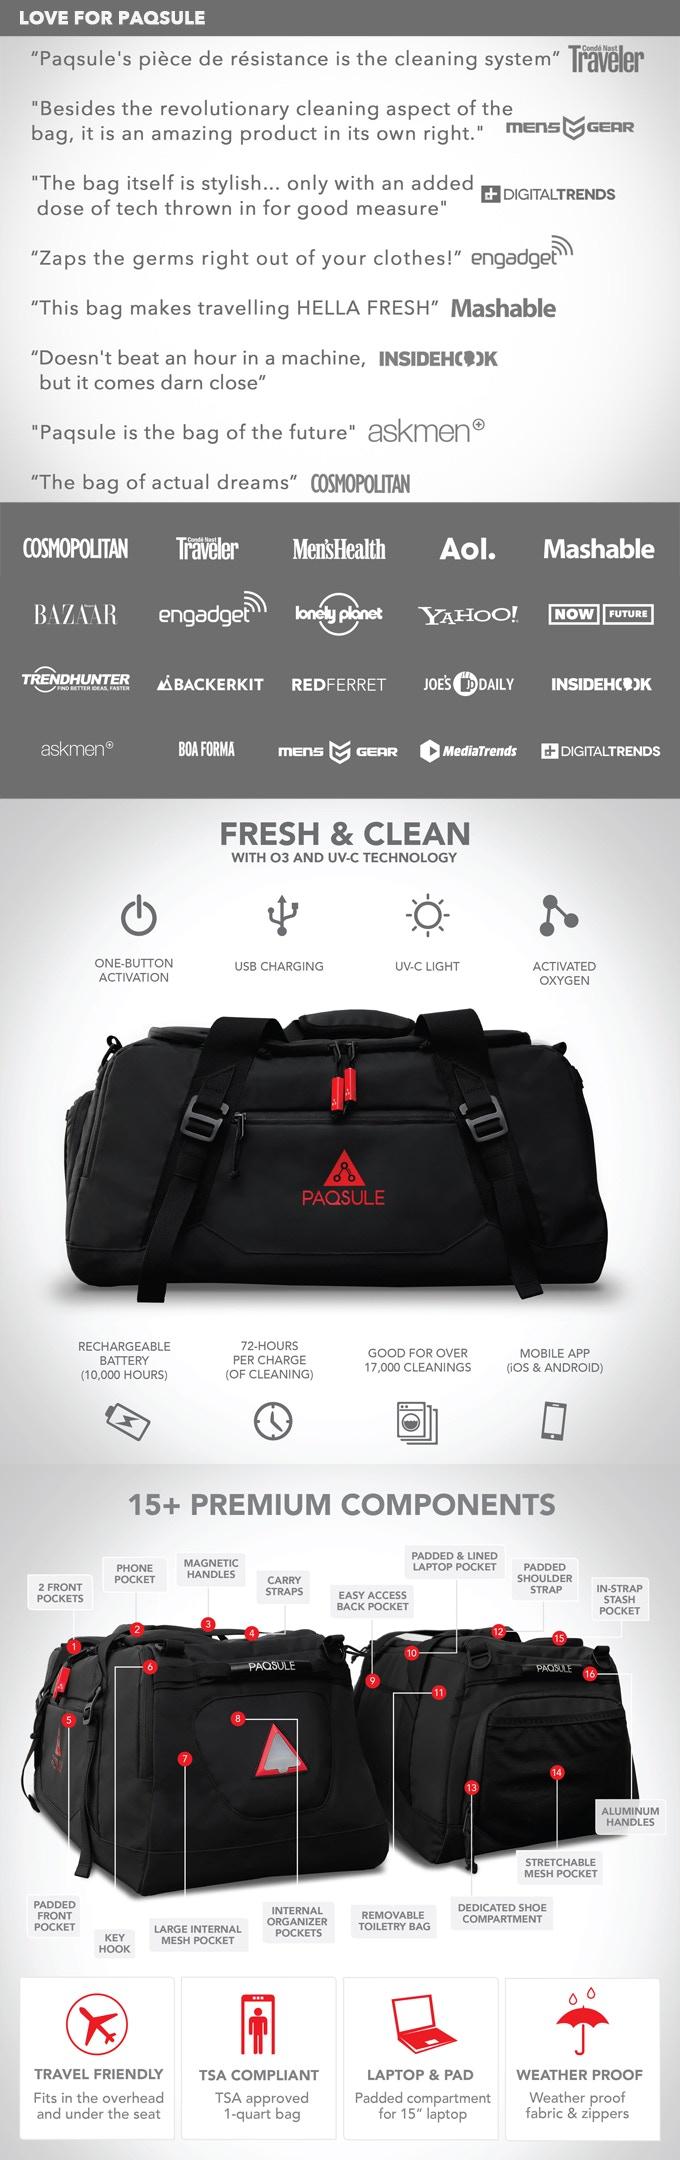 Ozone gym bag